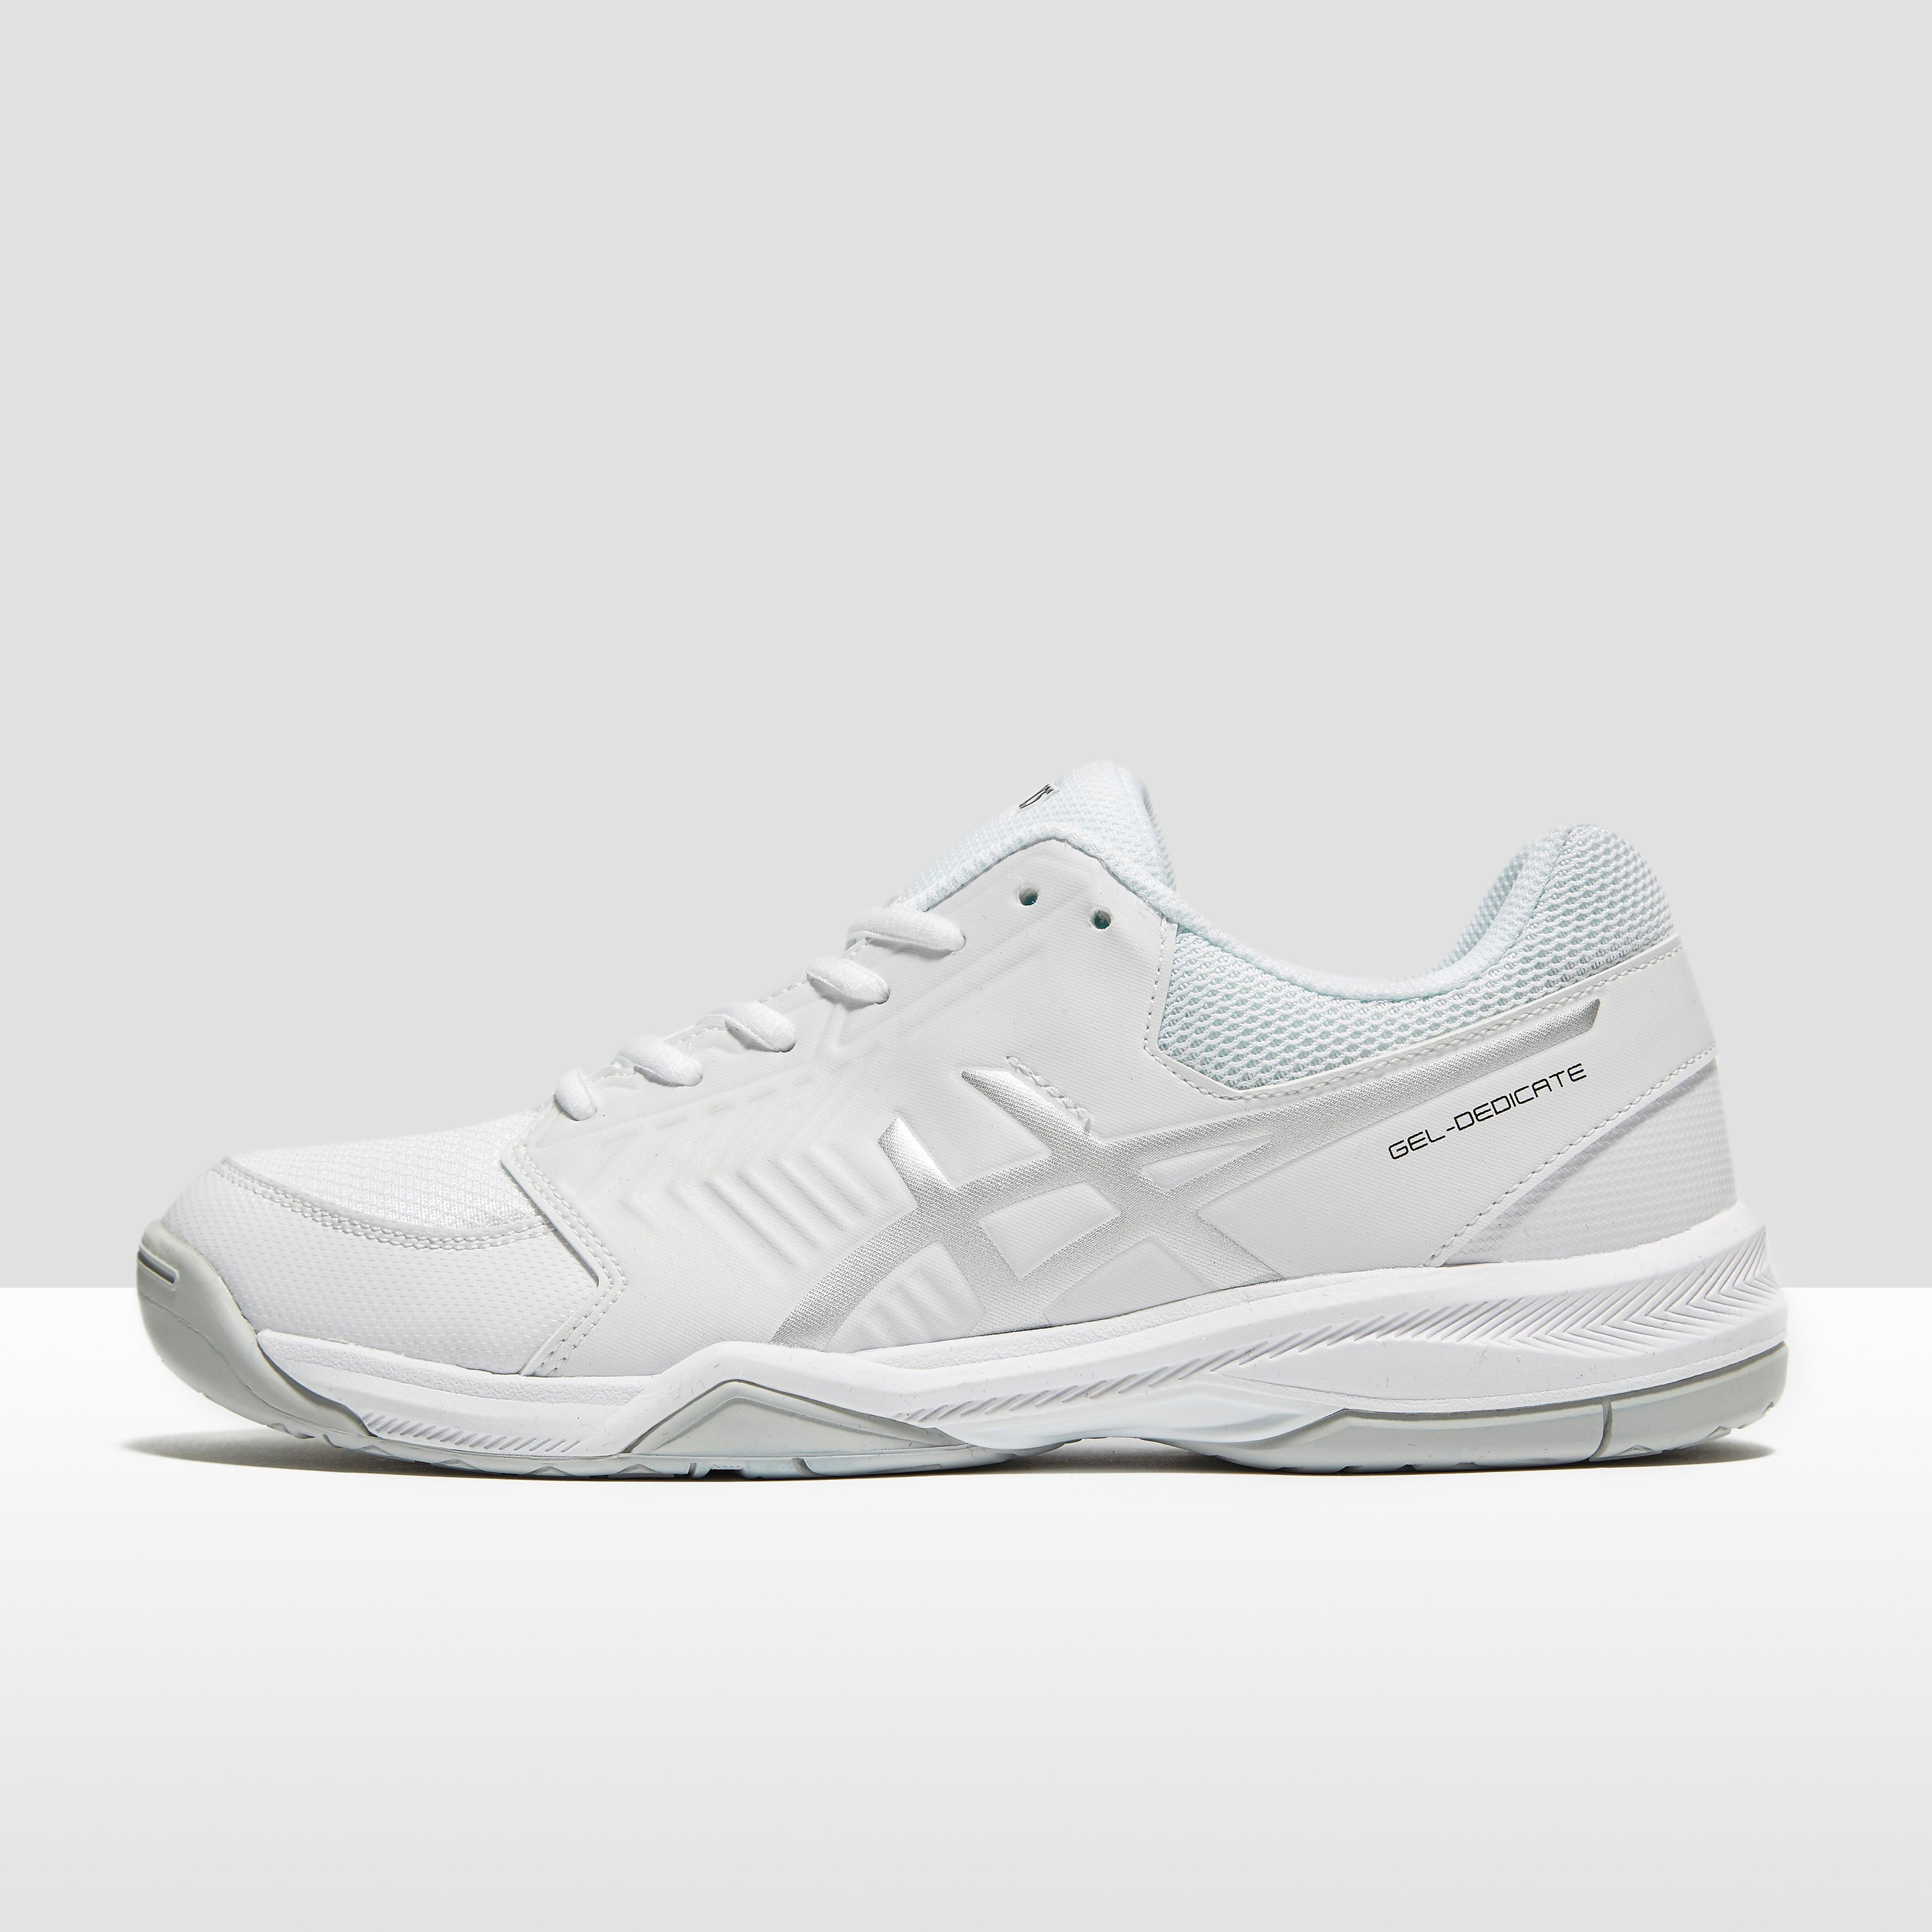 ASICS Men's GEL Dedicate 5 Tennis Shoes